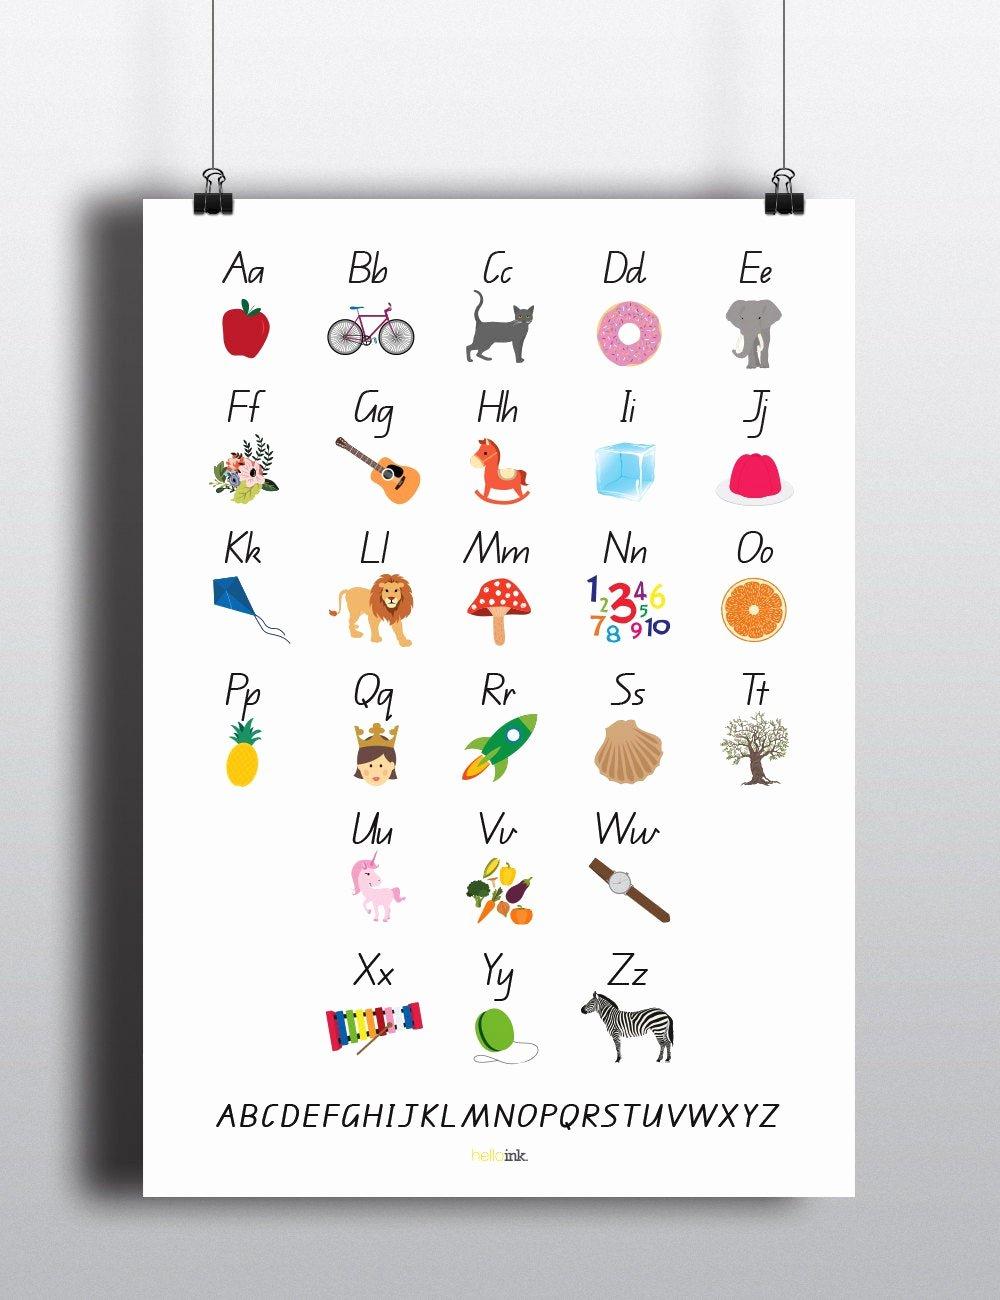 Alphabet Poster for Classroom Luxury Alphabet Poster Educational for Classroom Queensland